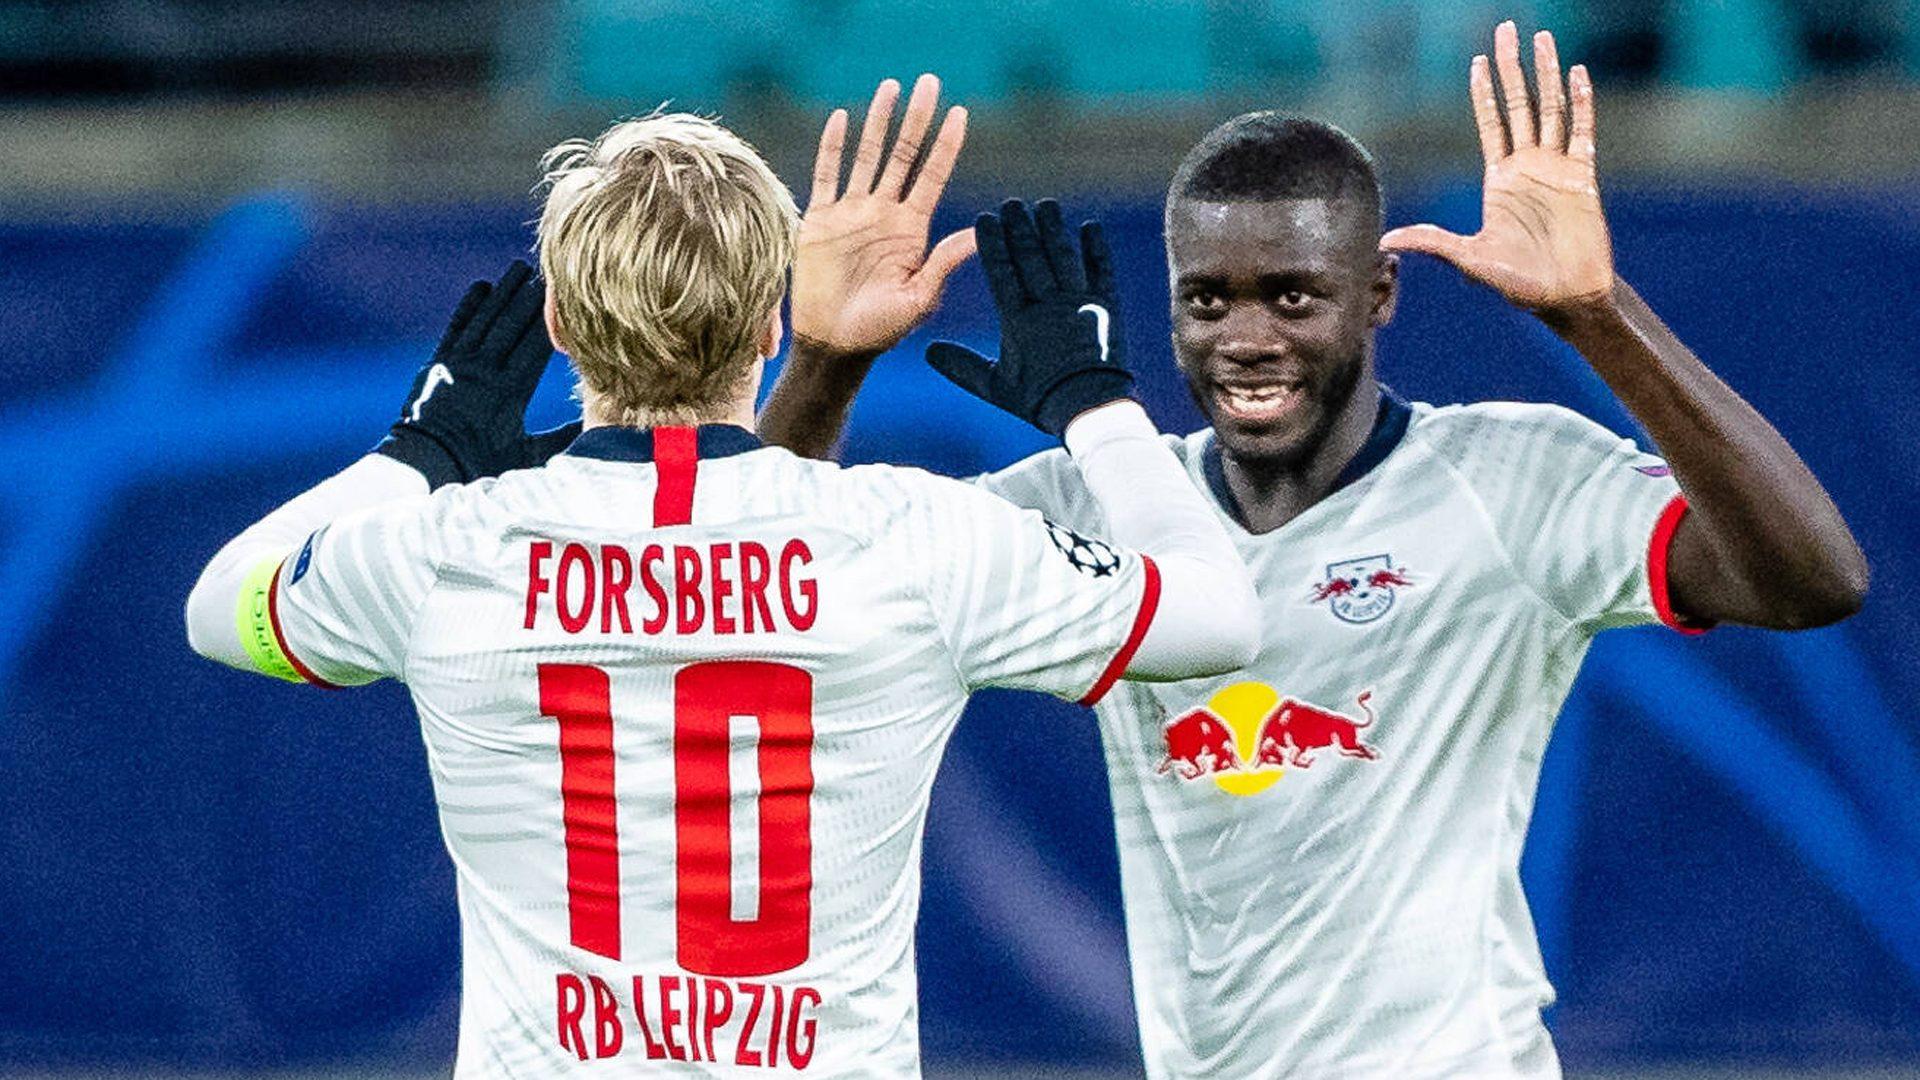 Bundesliga No One Gets Past Dayot Upamecano Not Even Me Rb Leipzig S Emil Forsberg